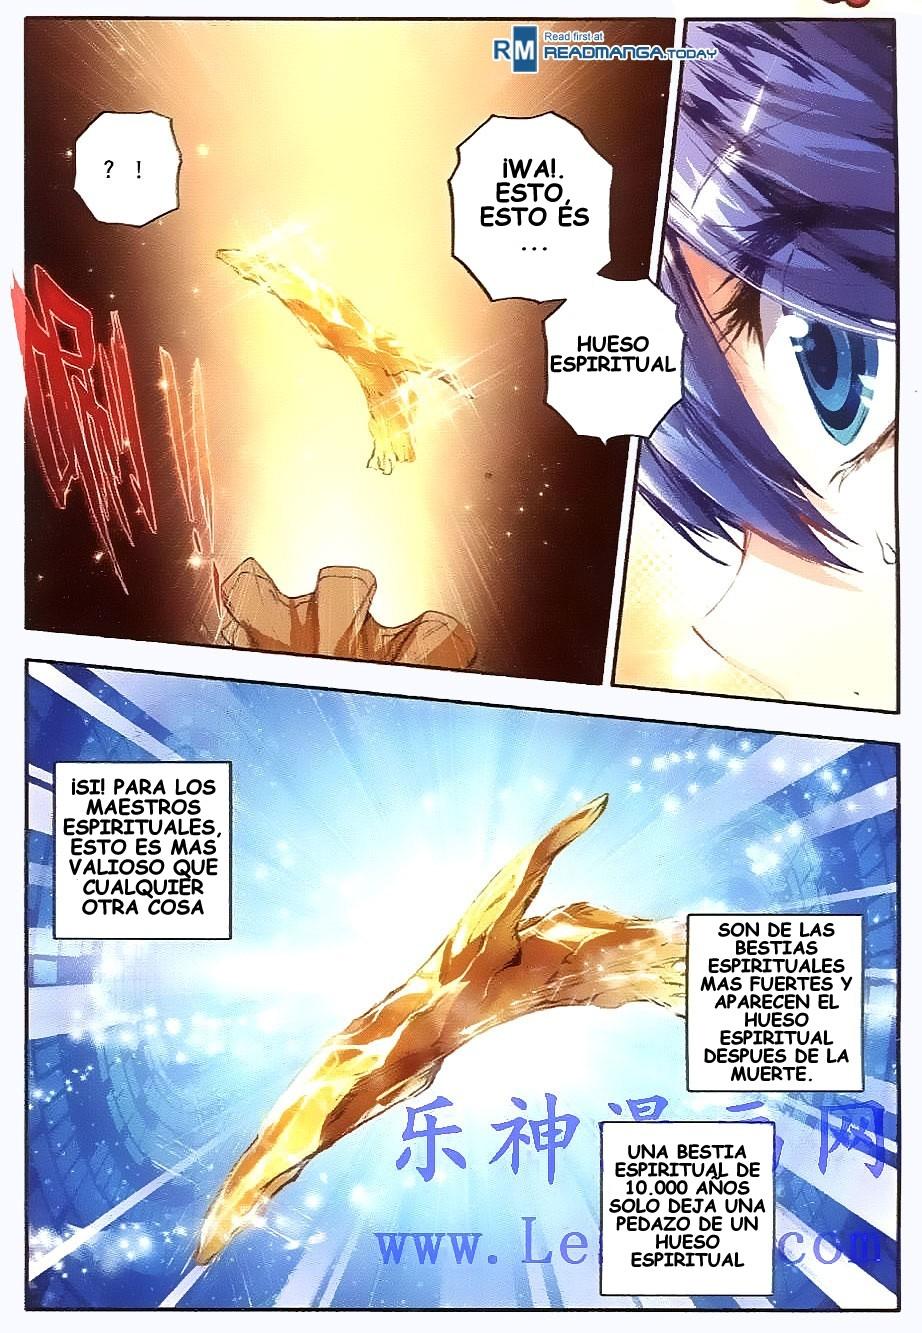 http://c5.ninemanga.com/es_manga/33/16417/422686/51ac520c783d88964a793e455dae3506.jpg Page 7